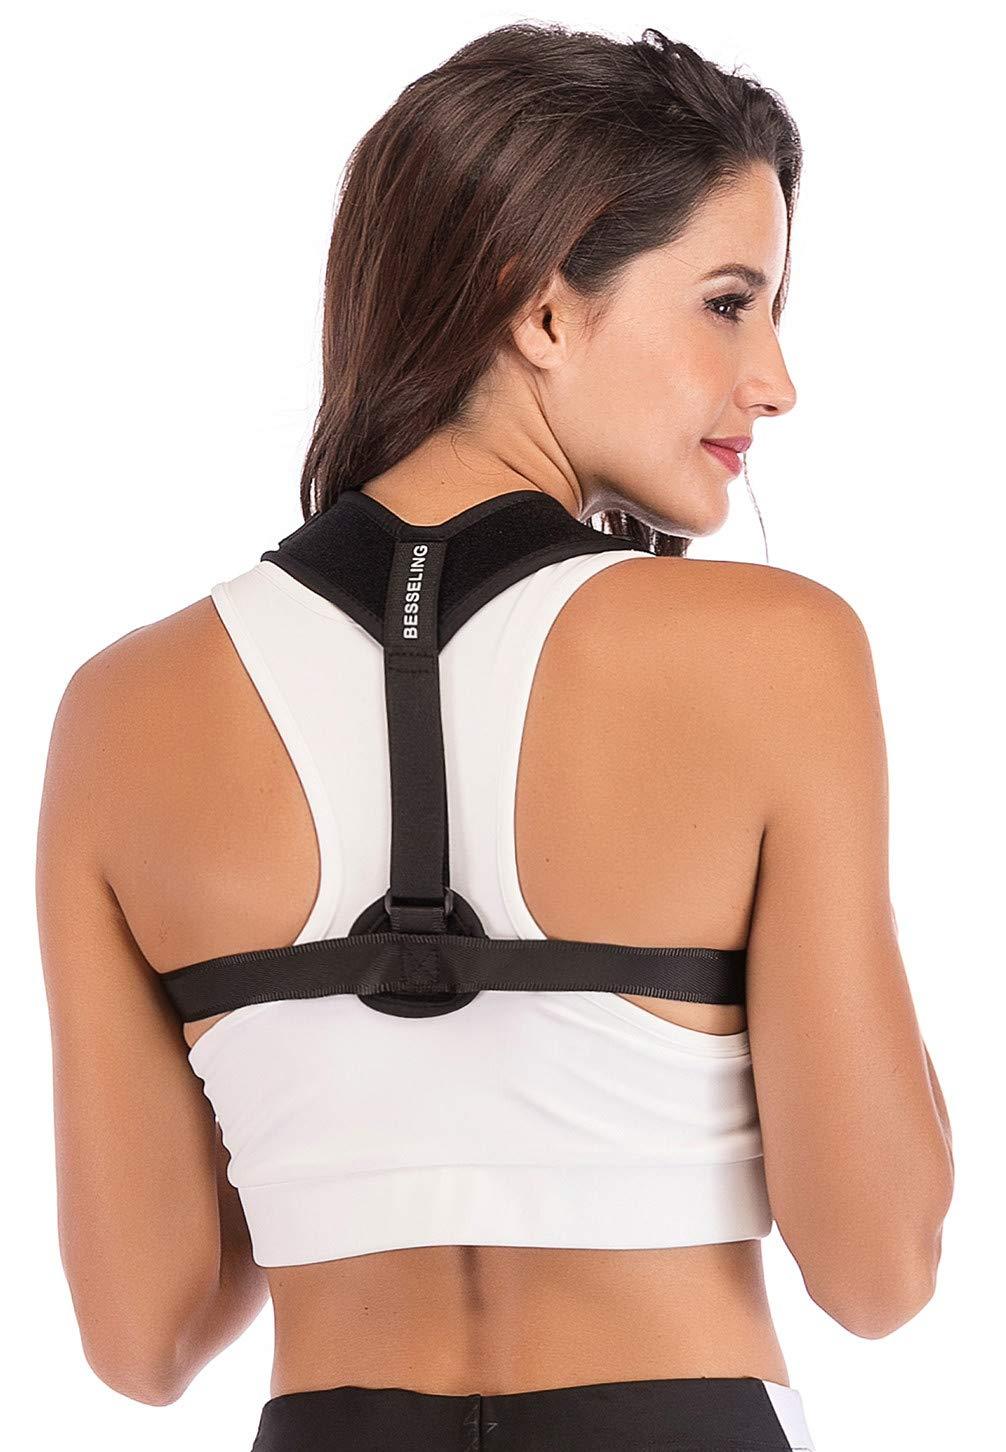 Back Posture Corrector for Women & Men Besseling Comfortable Back Support Brace Neck Back Pain Relief Adjustable Shoulder Posture Trainer Clavicle Correction for Slouching & Hunching FDA Approved